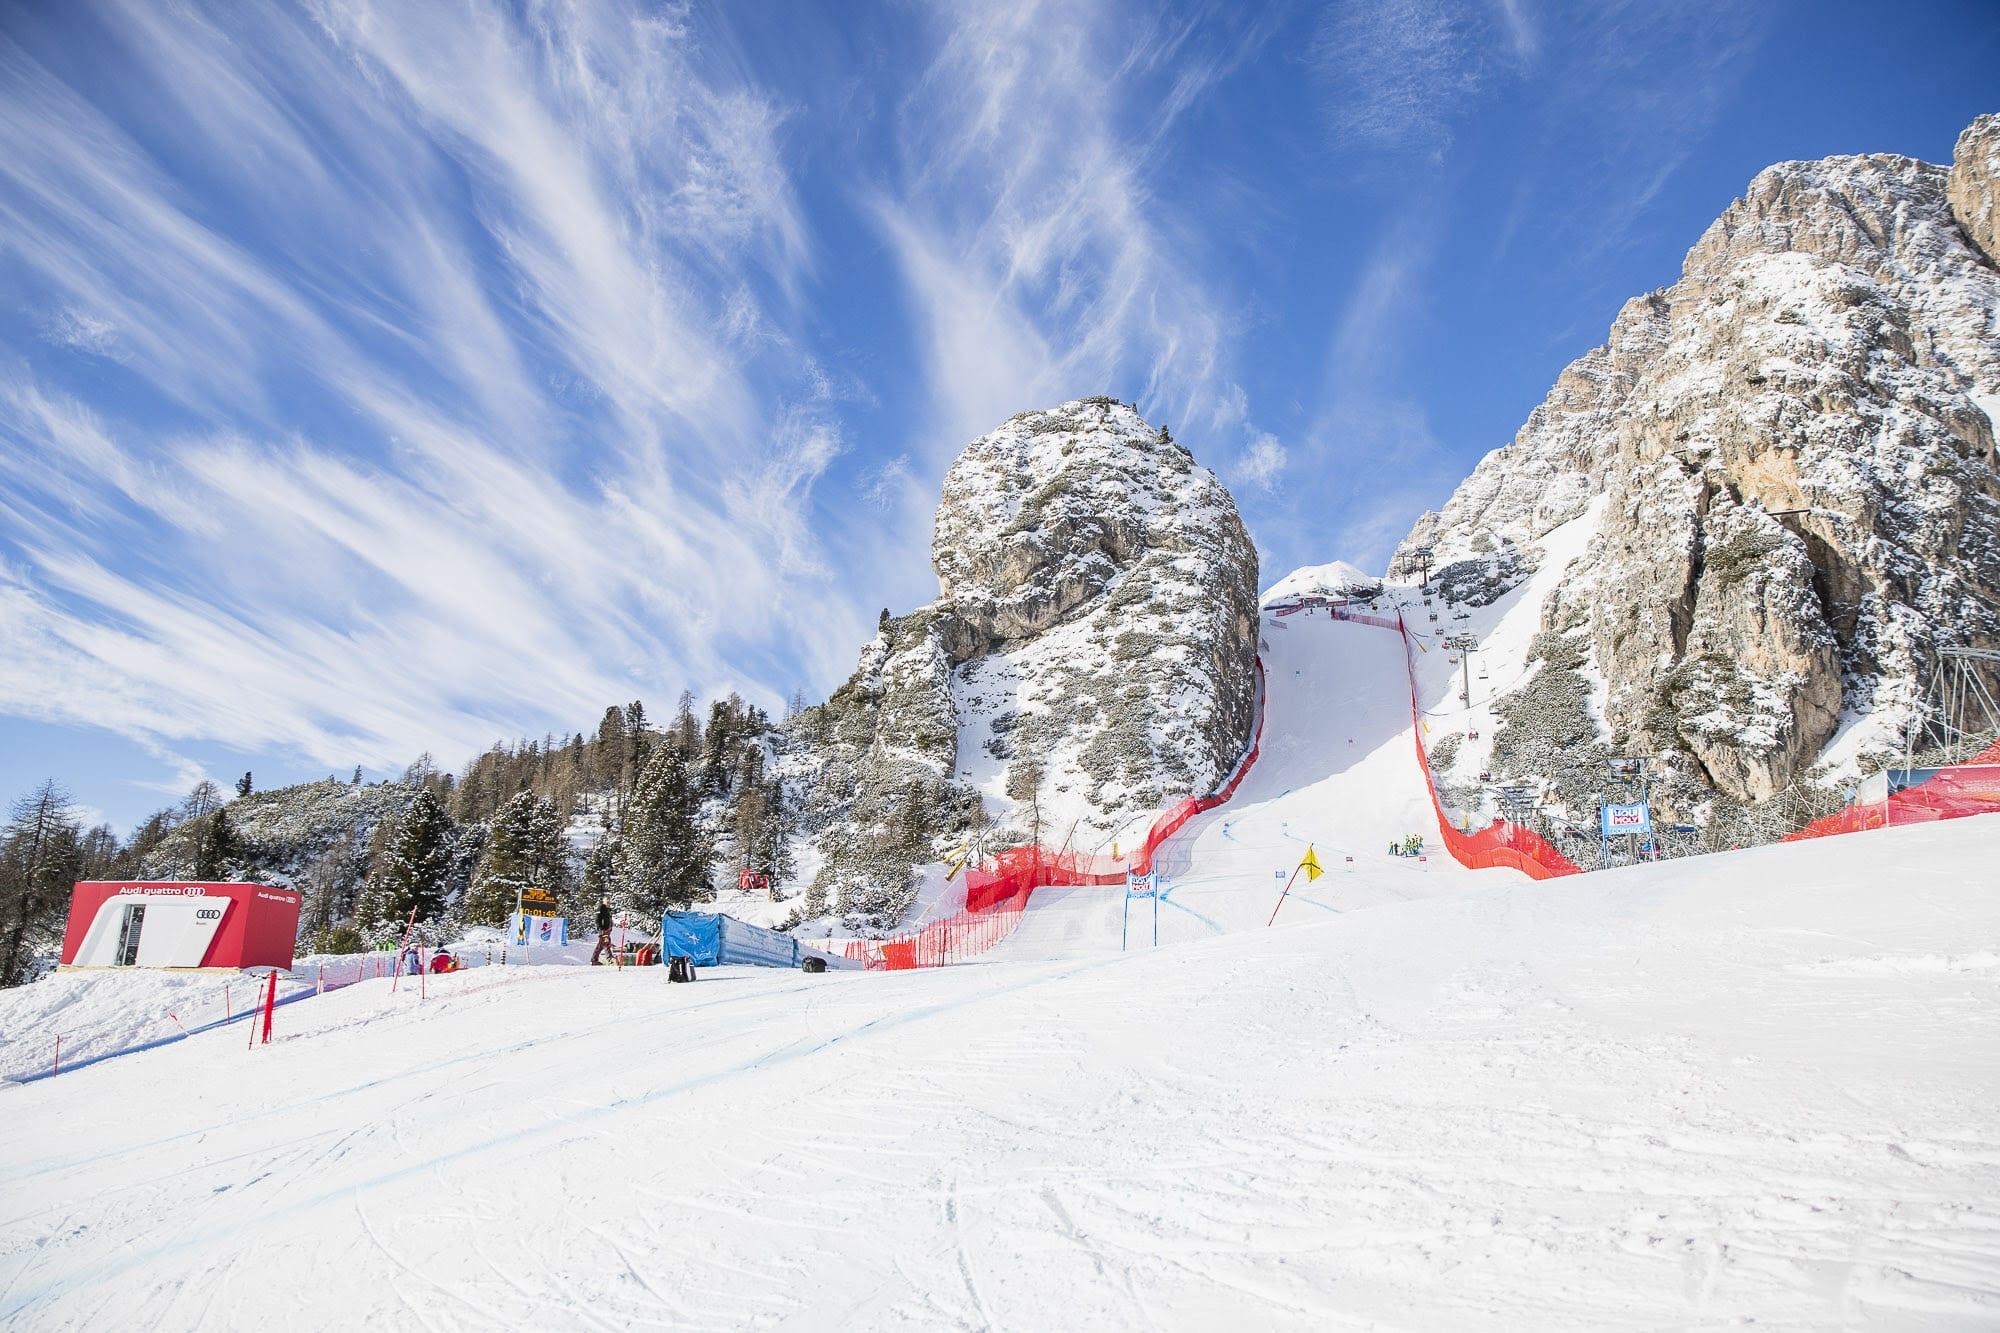 Calendrier Piste 2021 Cortina 2021 : le calendrier des épreuves – Top Ski News